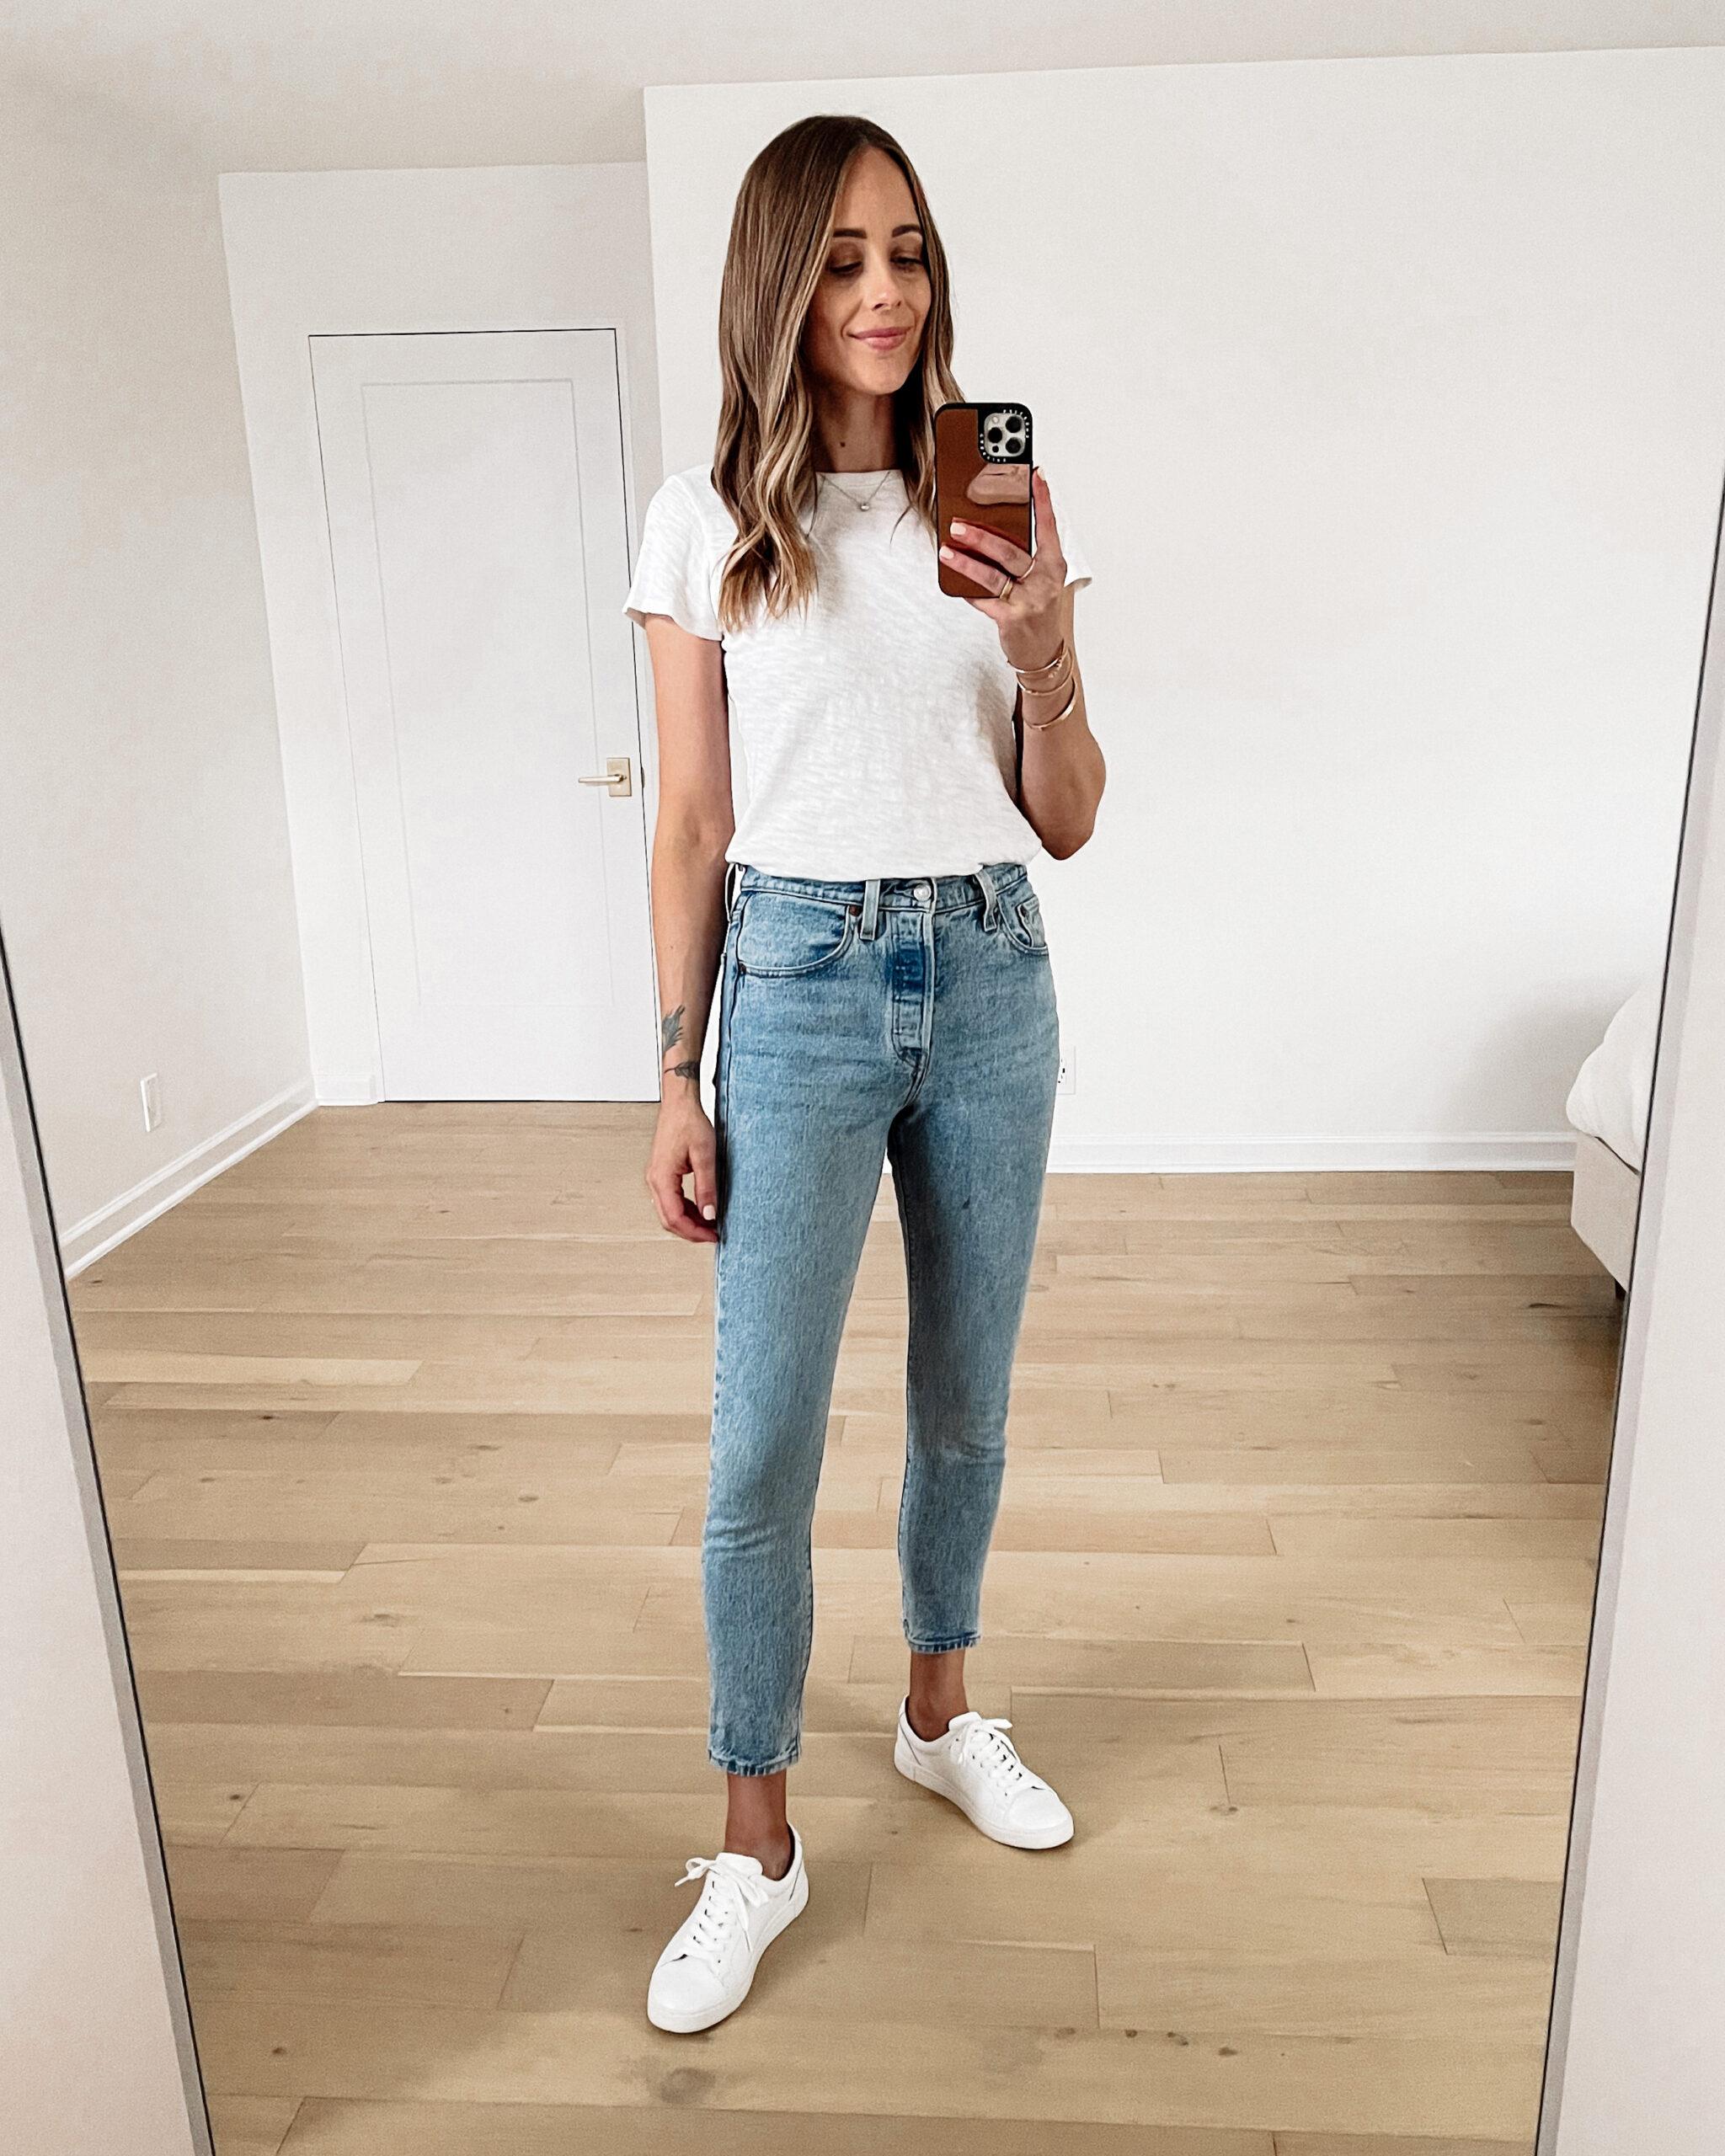 Fashion Jackson Wearing ATM White Tshirt Levis 501 Skinny Jeans Frye White Sneakers